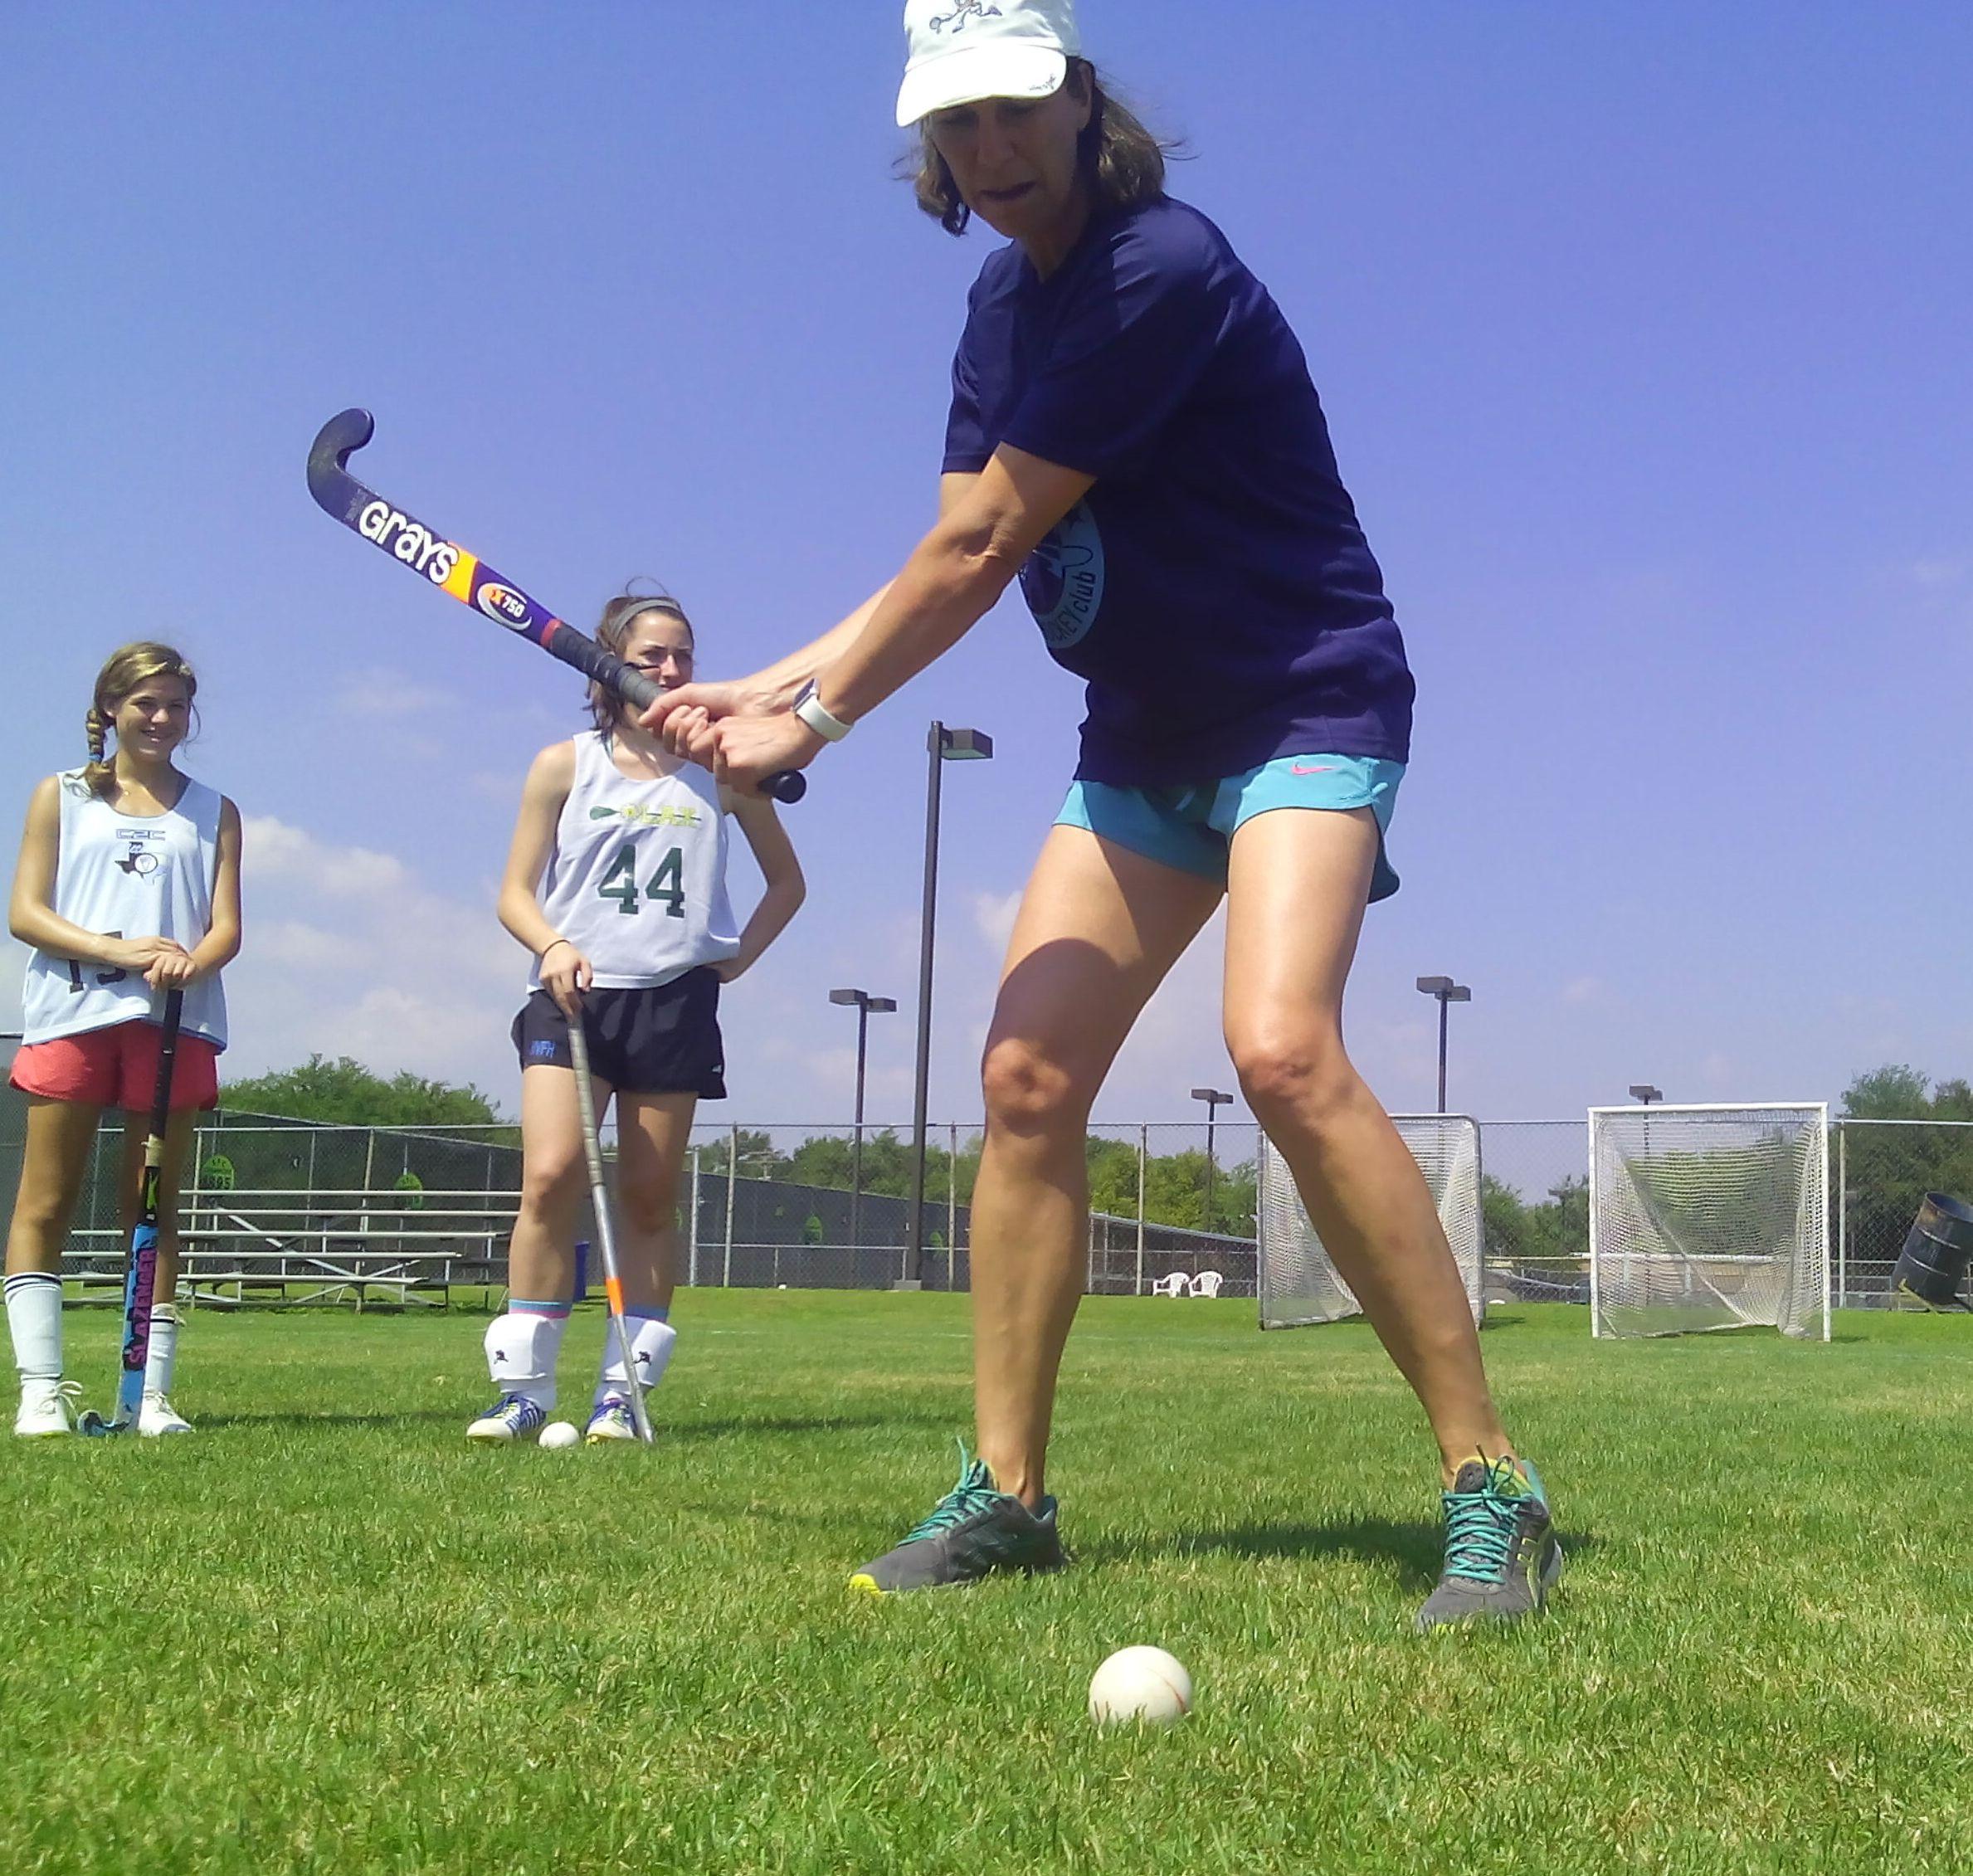 coach Bremner